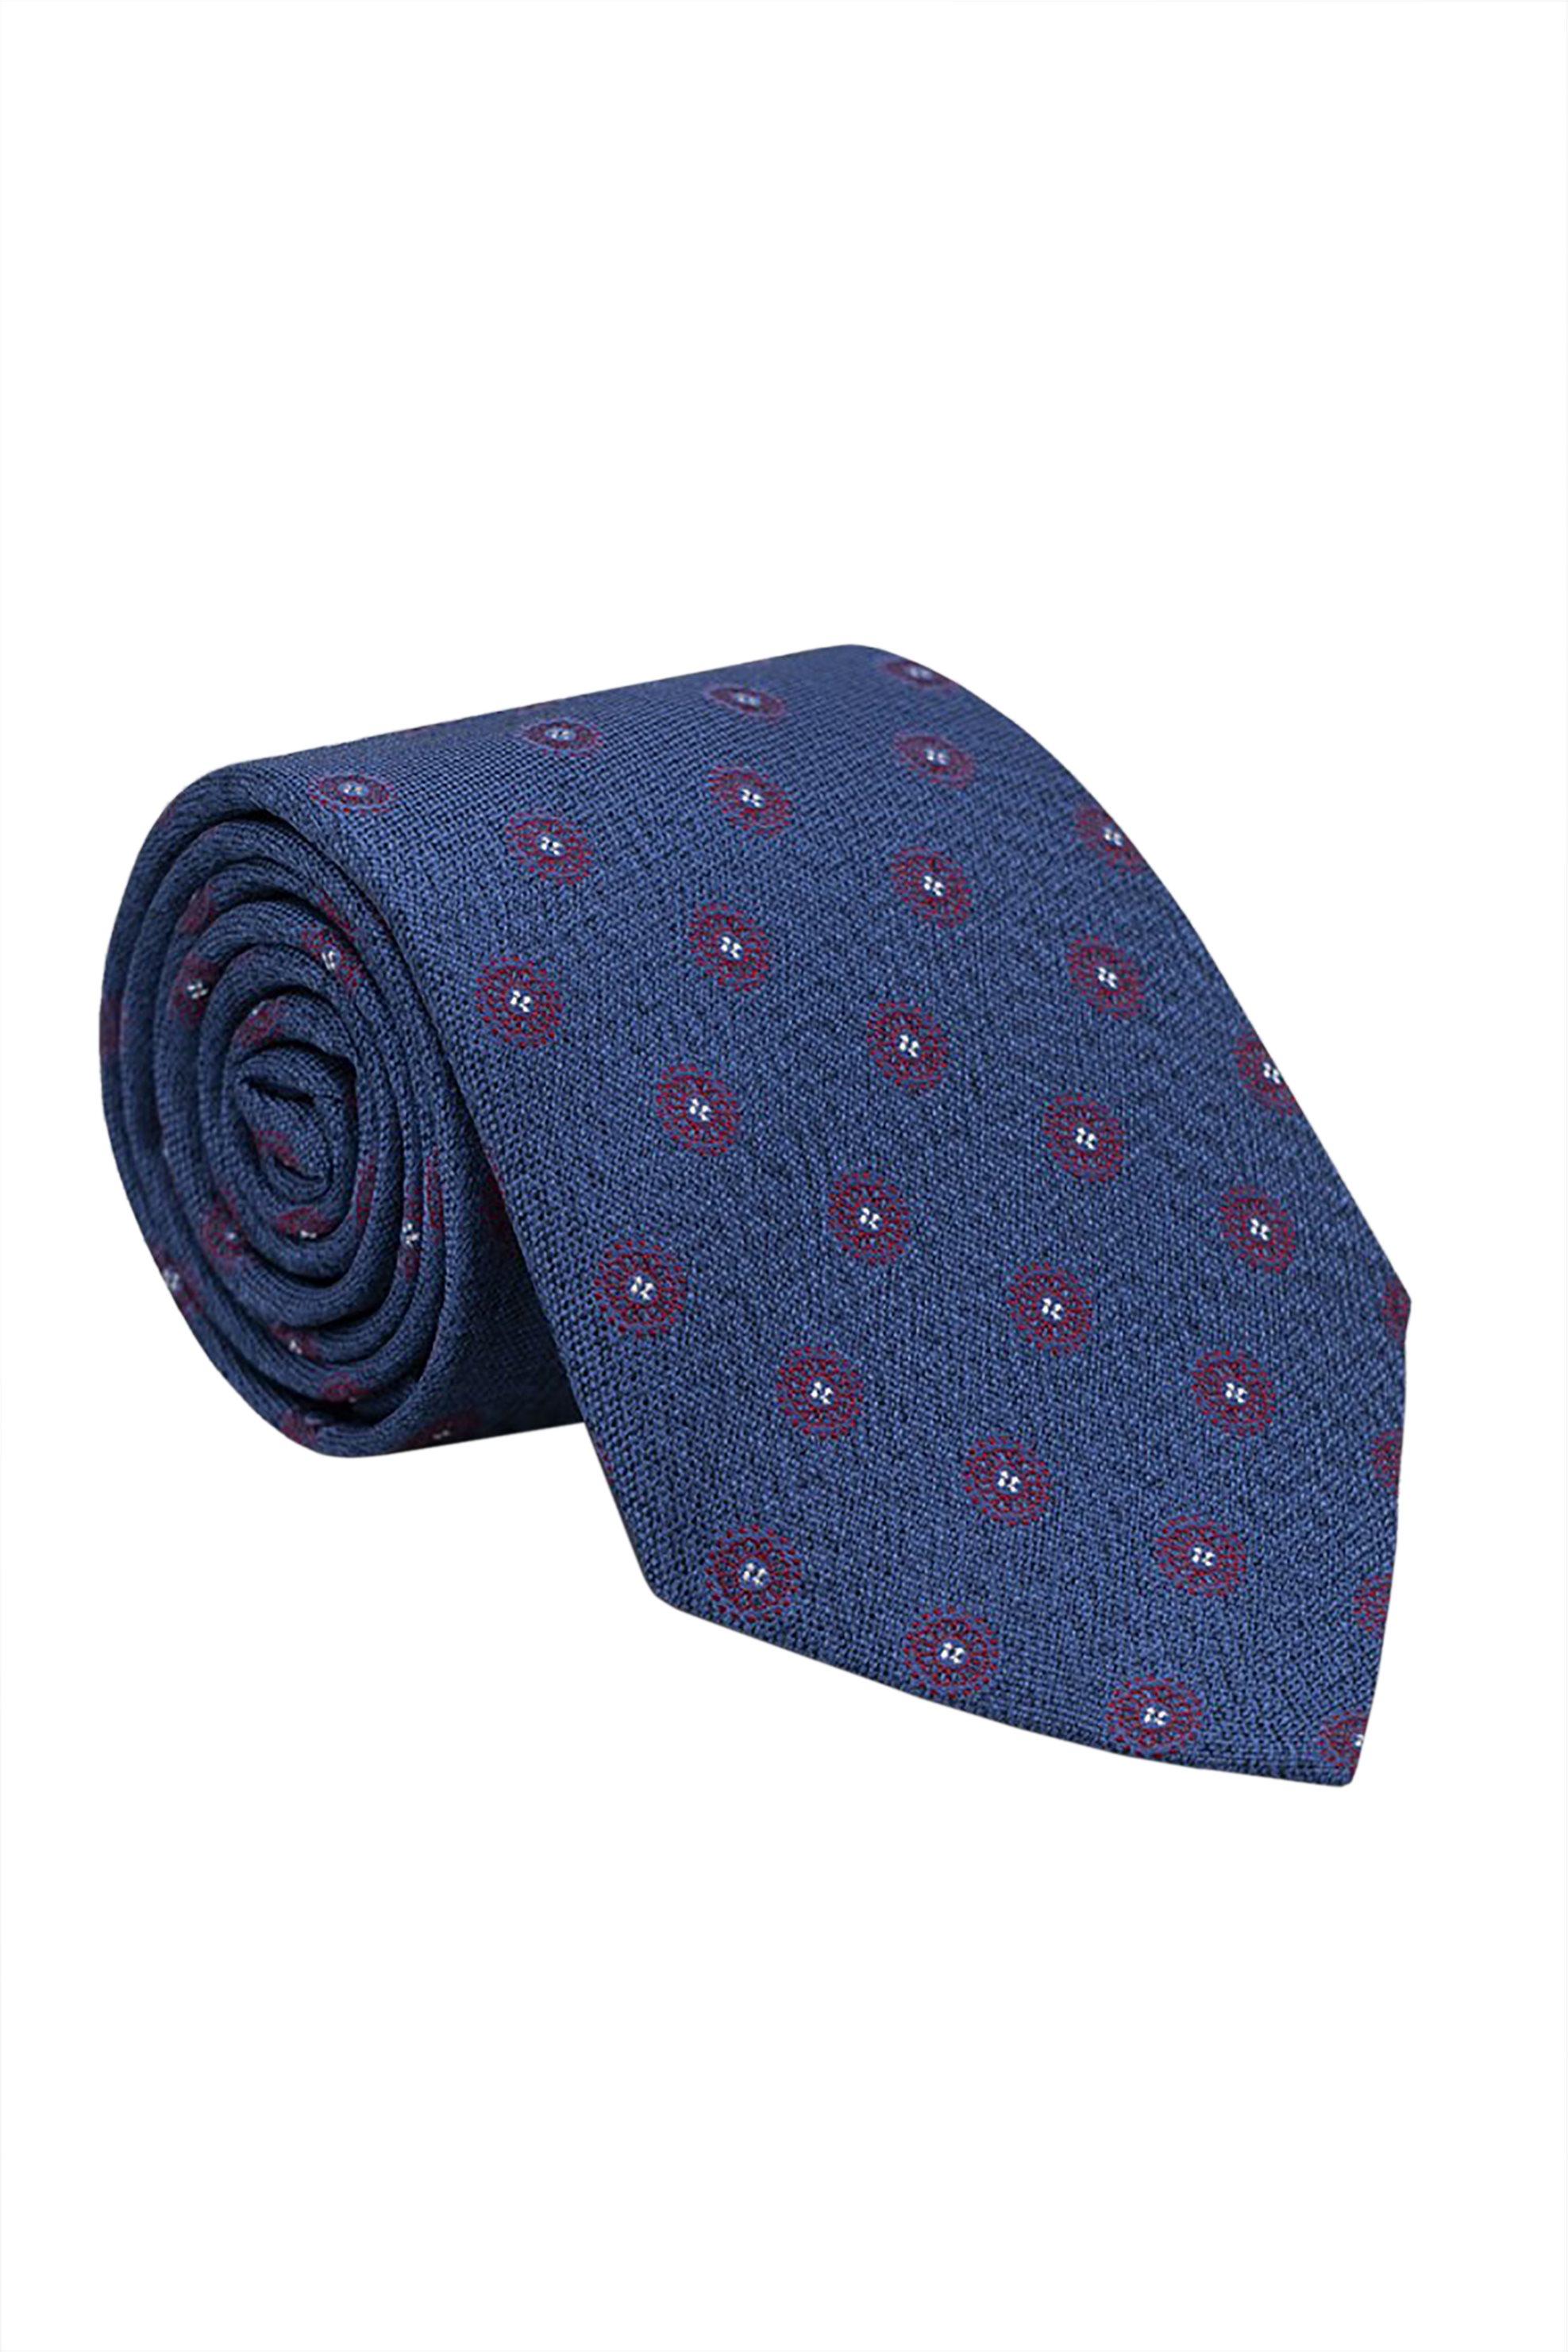 Oxford Company ανδρική μεταξωτή γραβάτα με all-over print - TIE51-411.02 - Μπλε